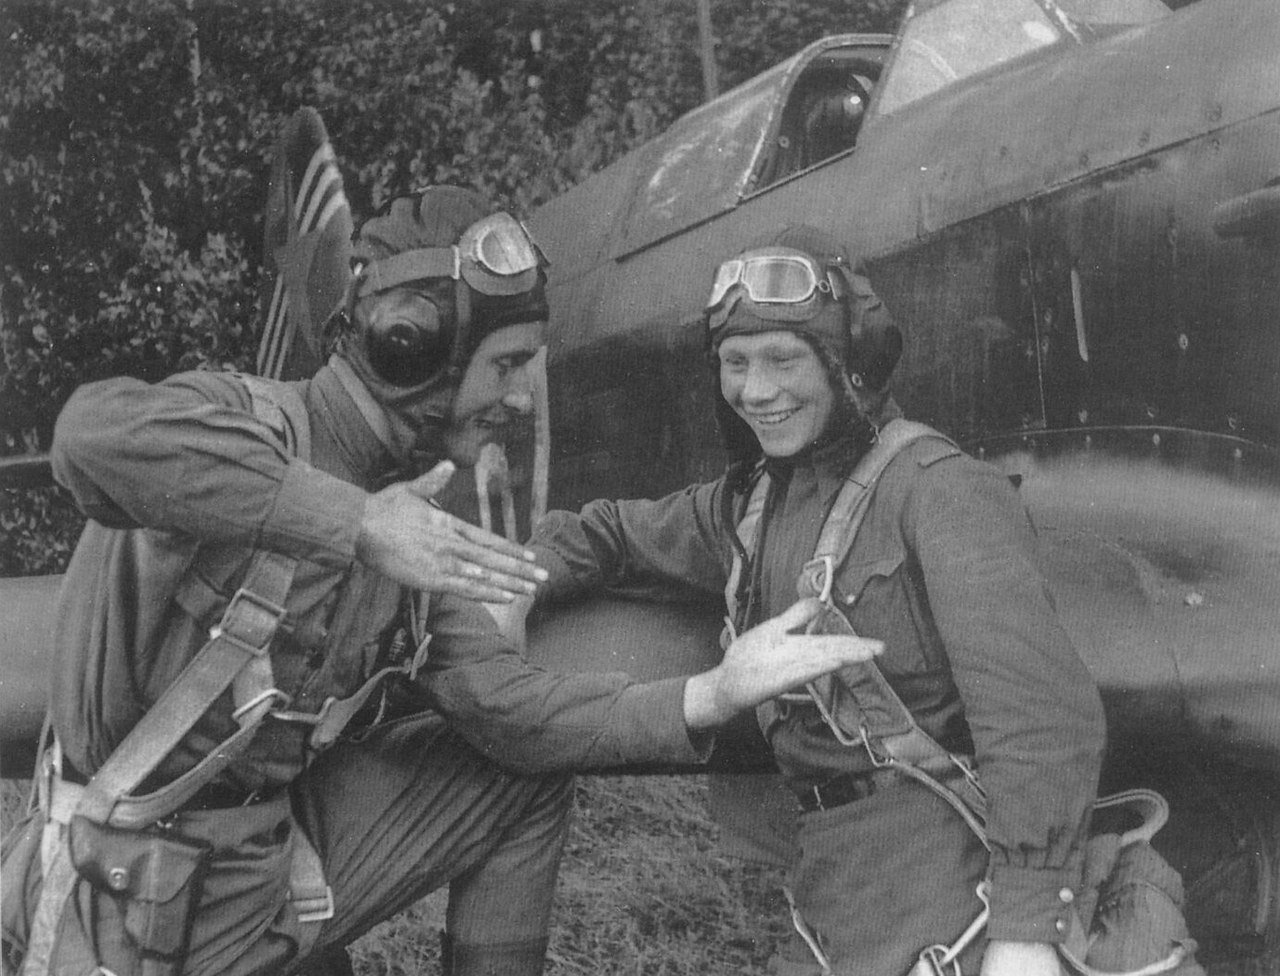 Картинки советских летчиков, юбилеем лет